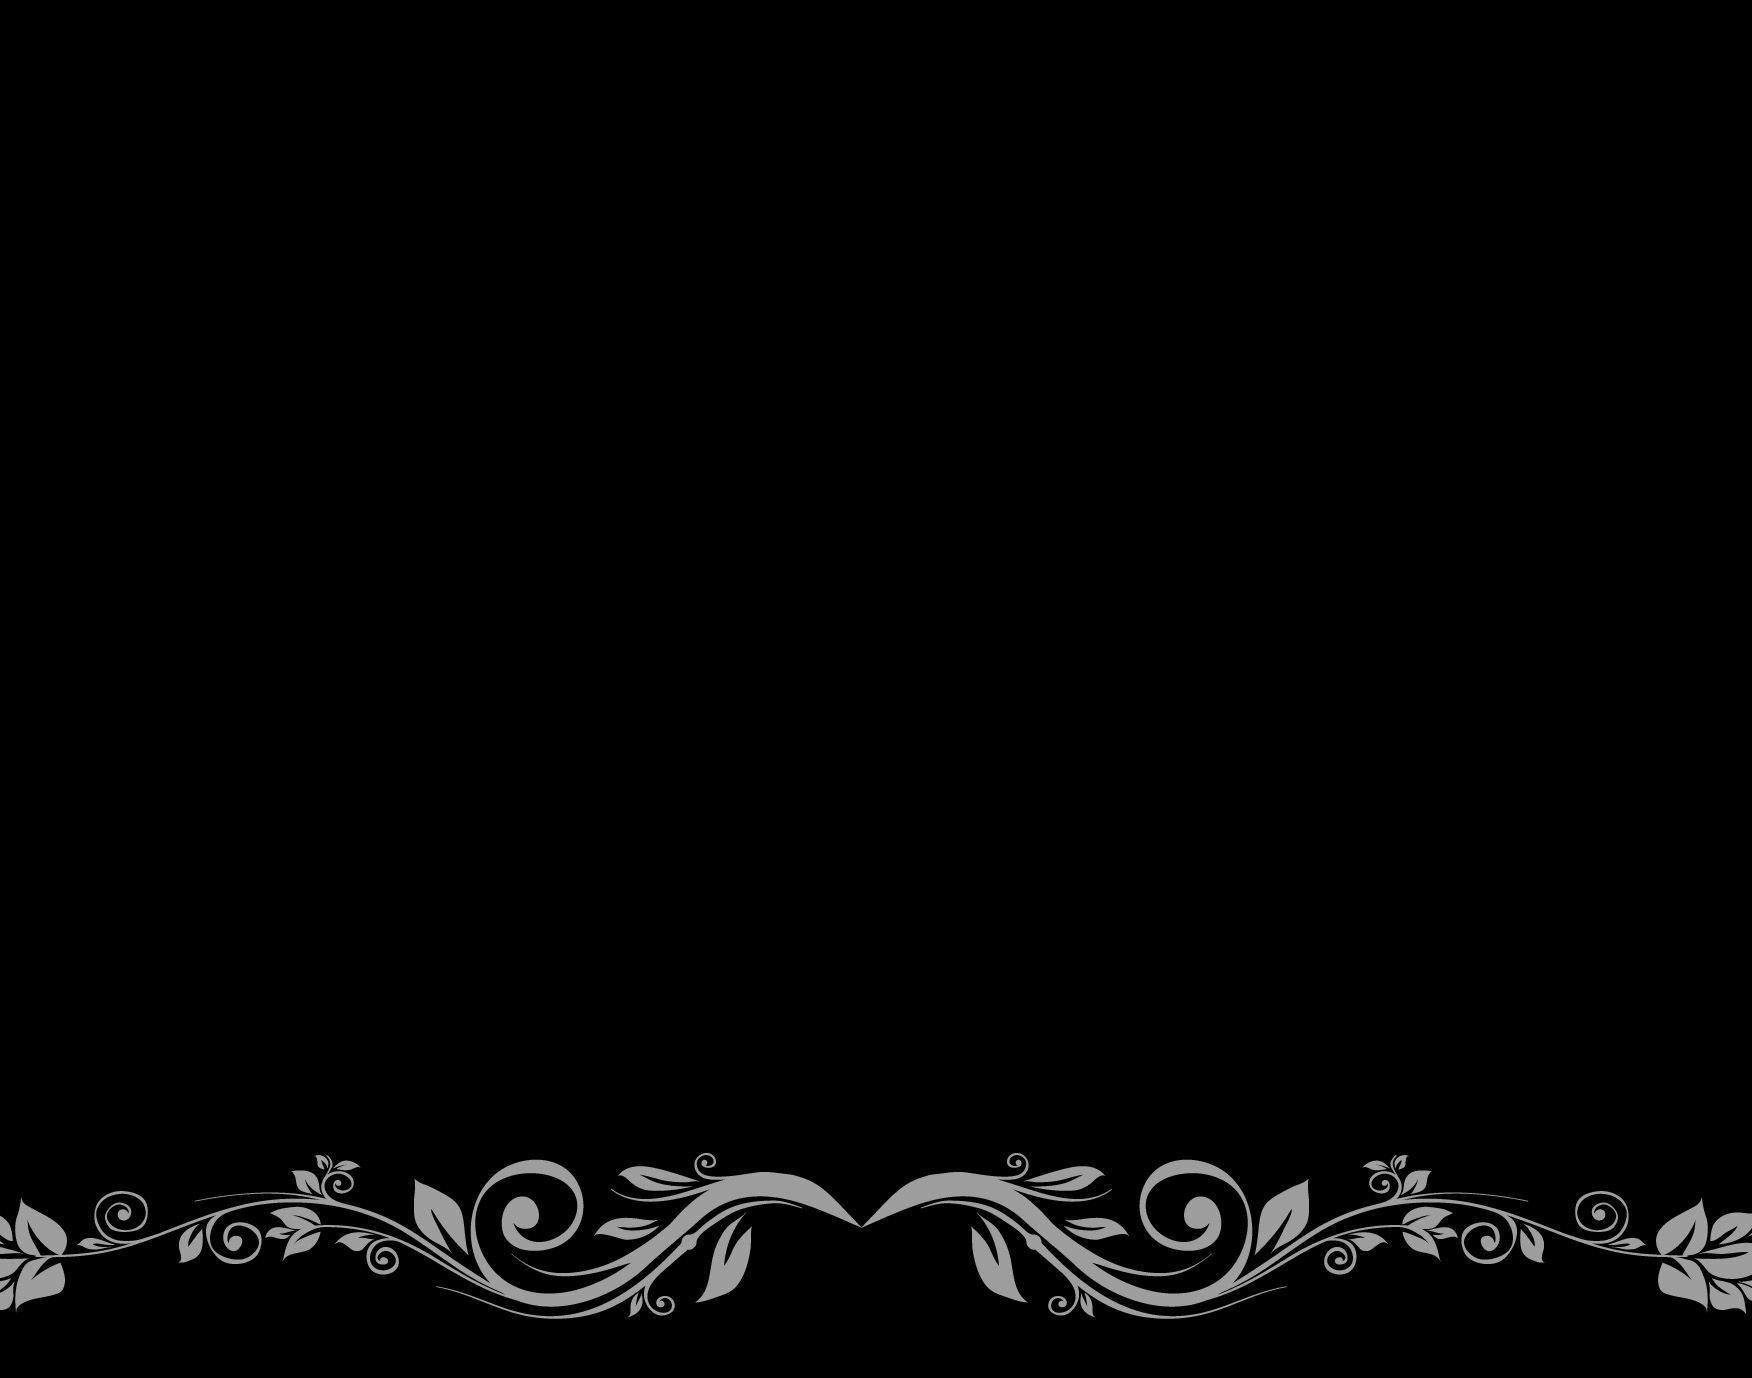 Elegant Black Backgrounds - Wallpaper CaveElegant Black And White Backgrounds